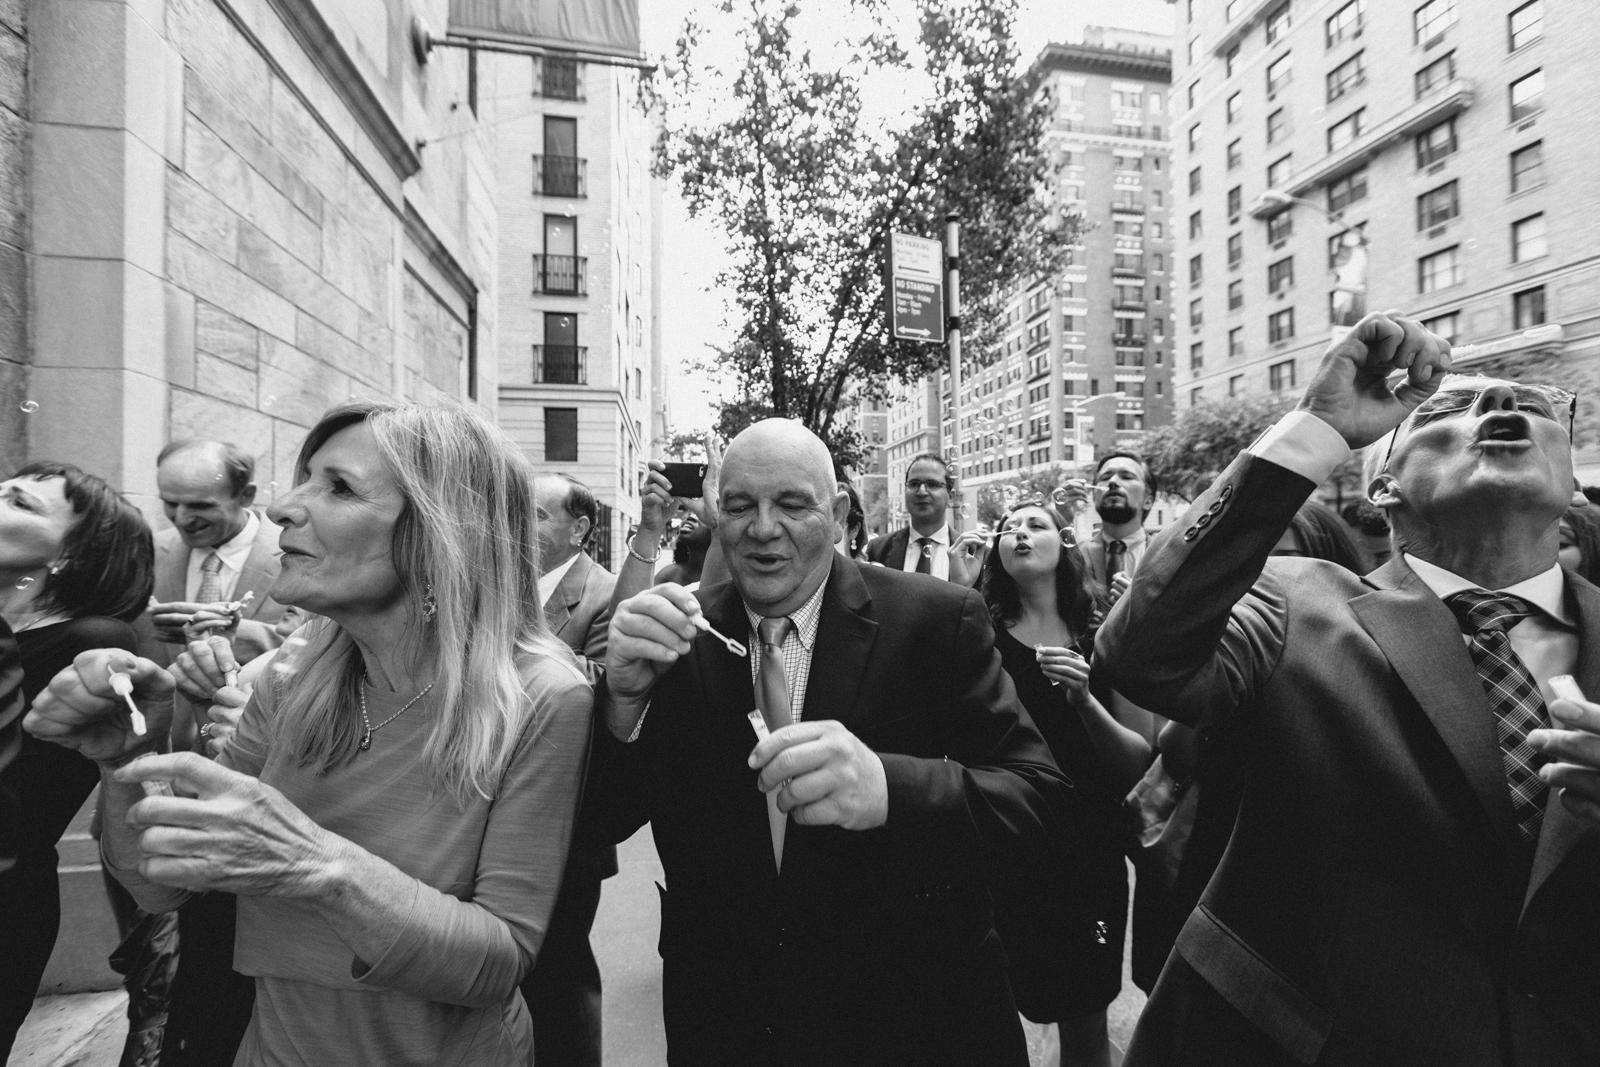 NYC Wedding Photography Sofitel Central Park Brooklyn Photographer Boris Zaretsky _B2C2436.jpg